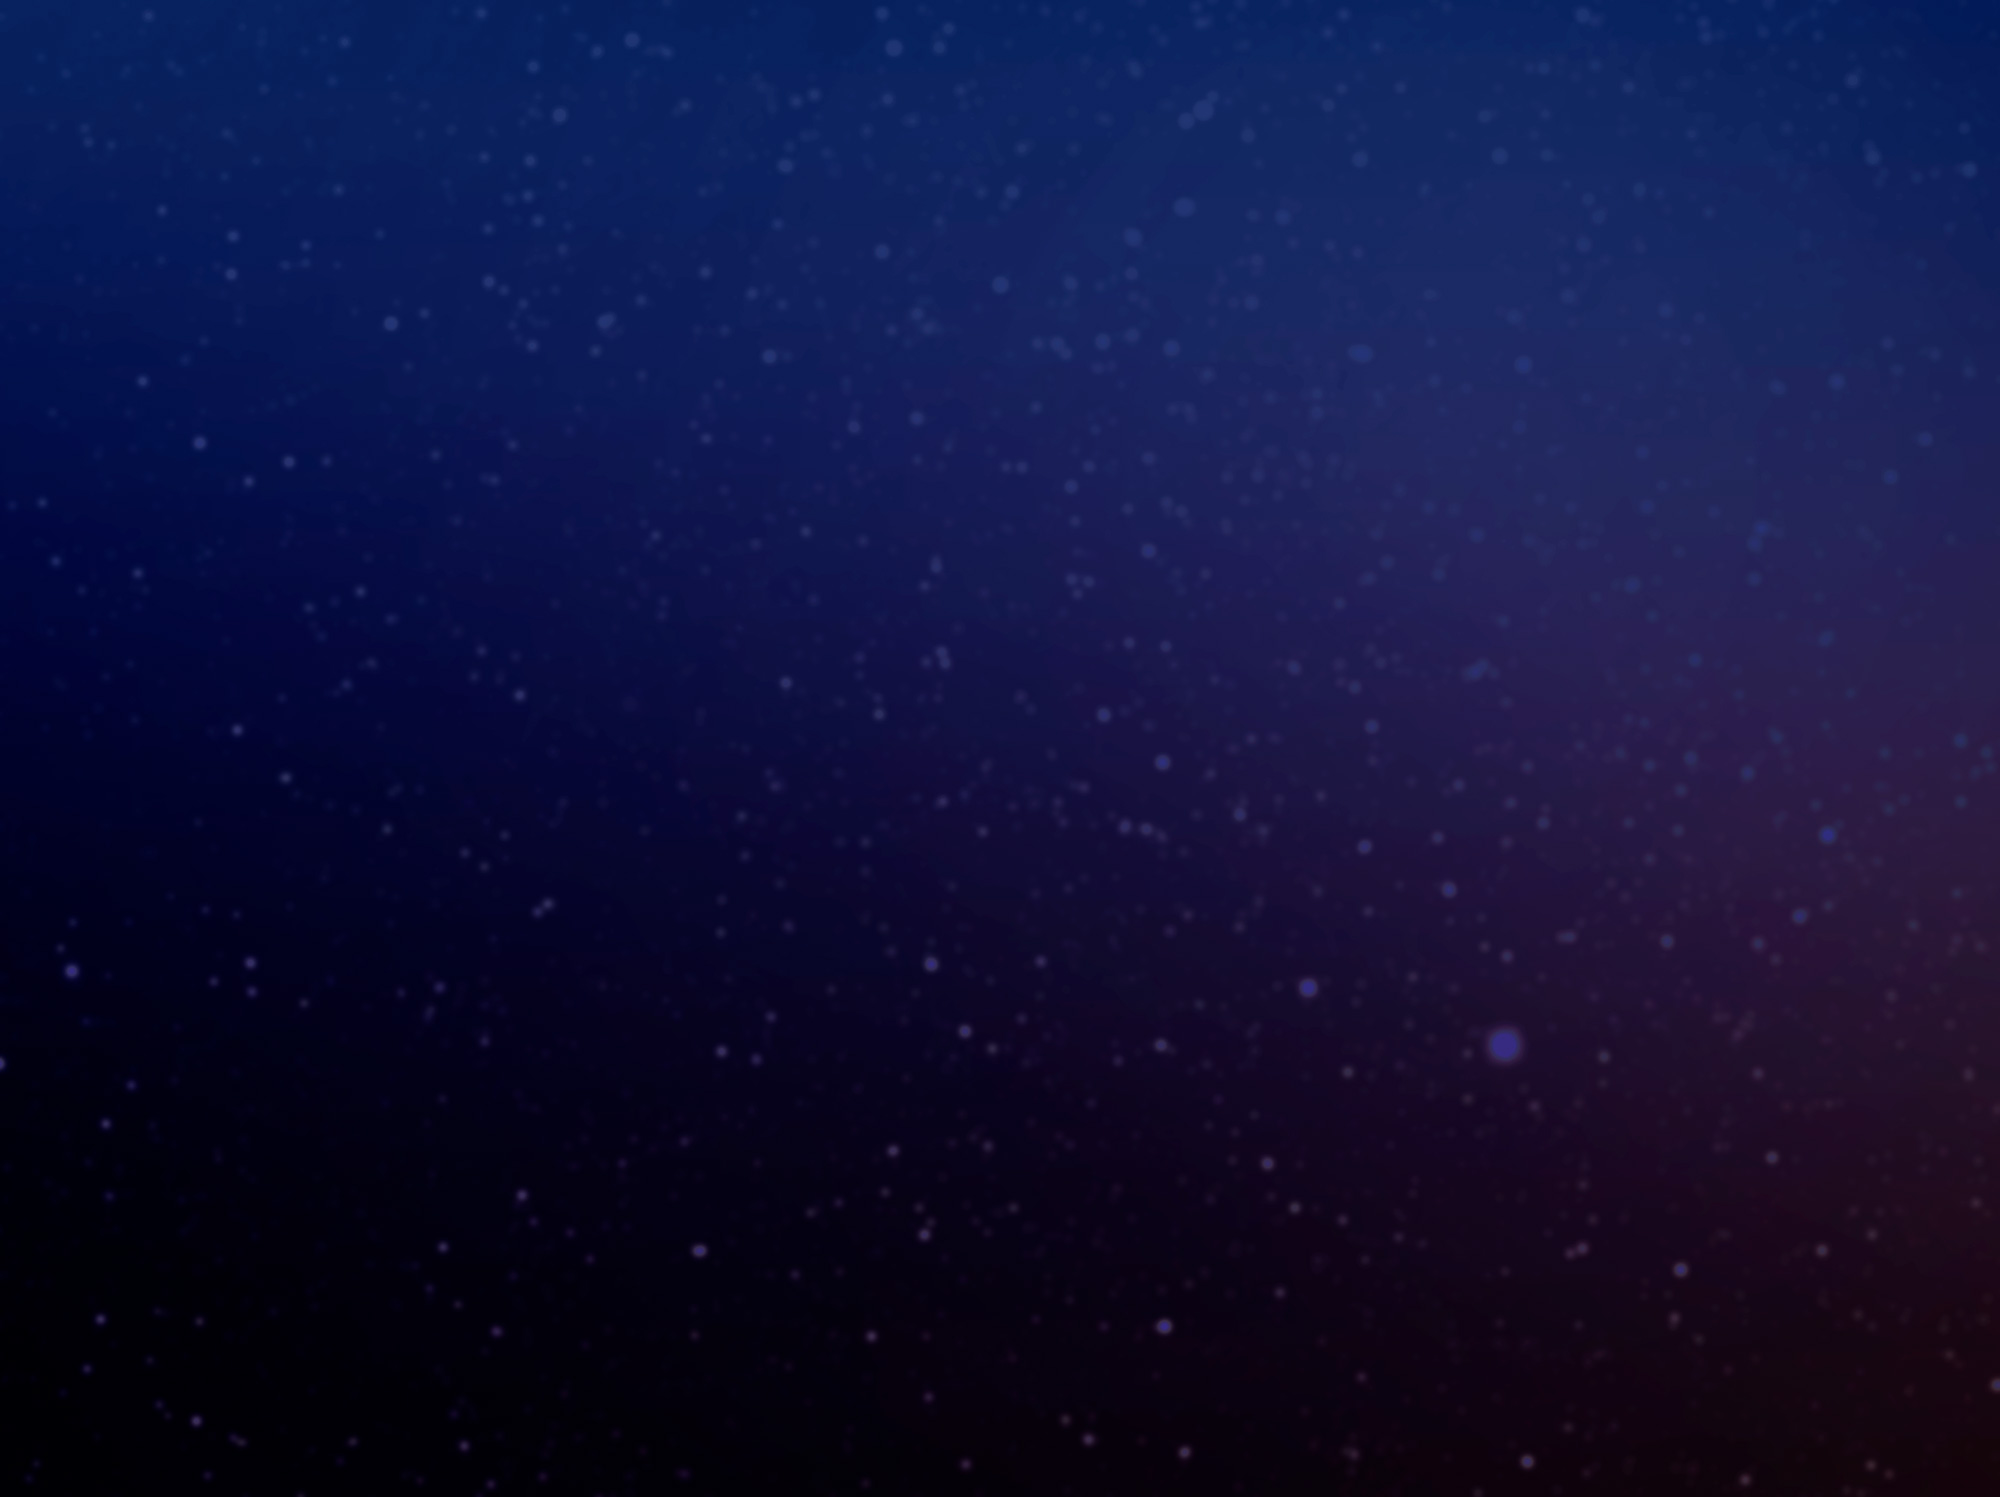 stars_poster